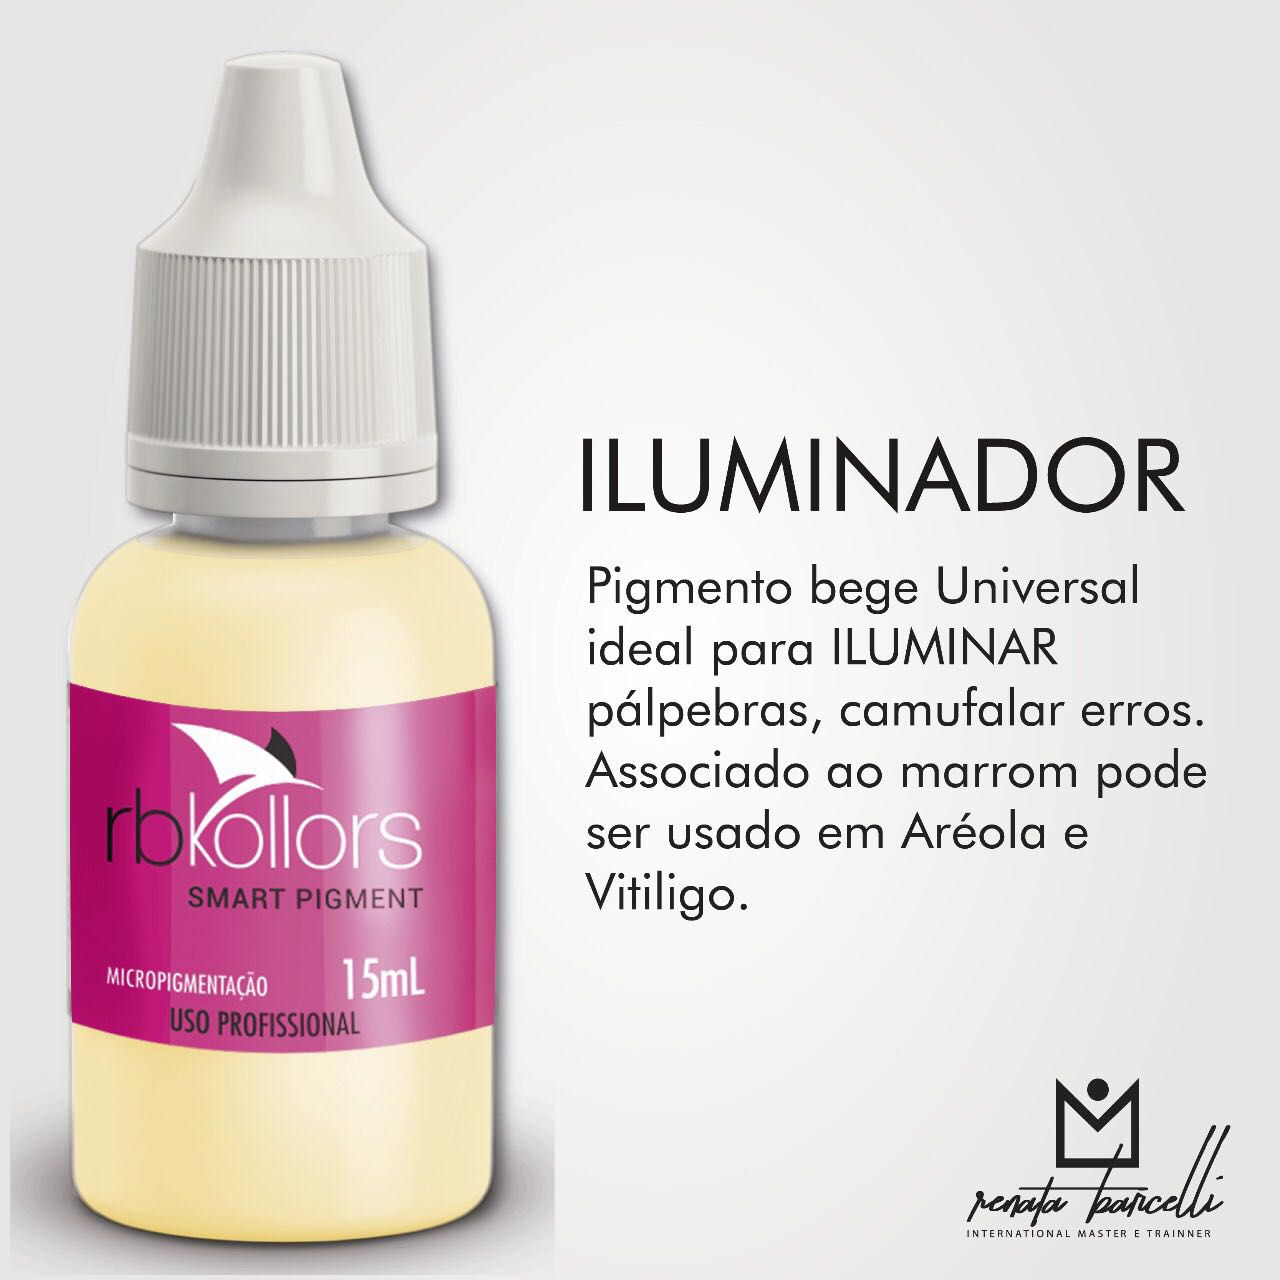 PIGMENTO RB KOLLORS - ILUMINADOR  - Misstética